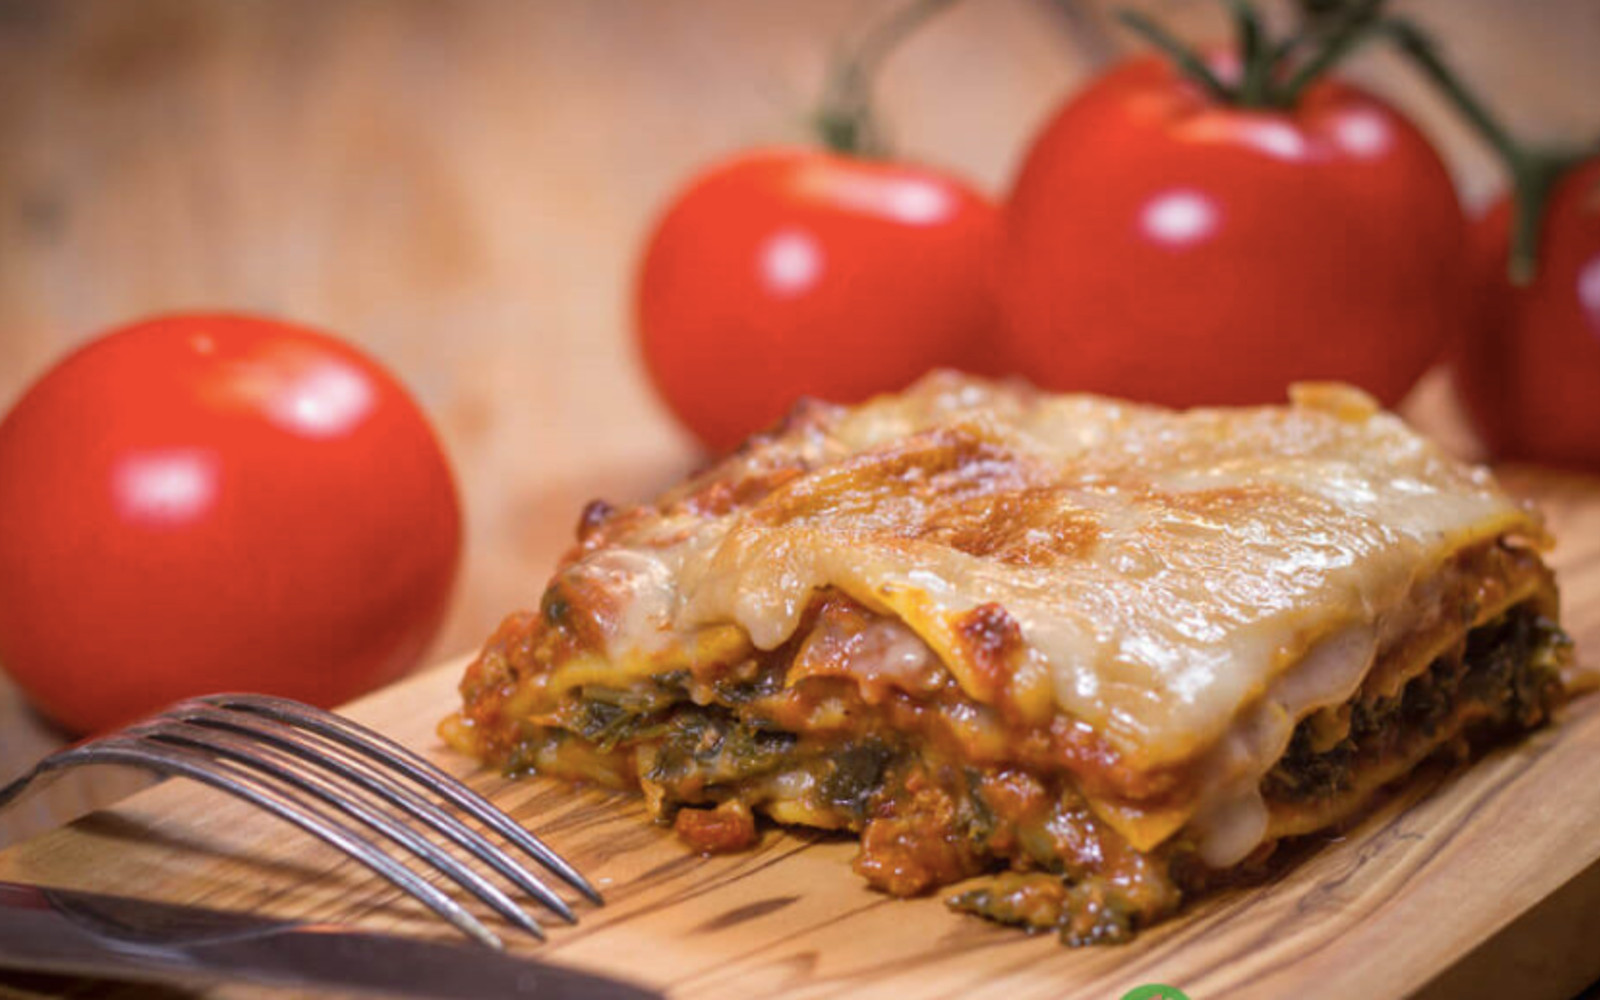 Vegan Gluten-Free Kale Lasagna with bechamel sauce